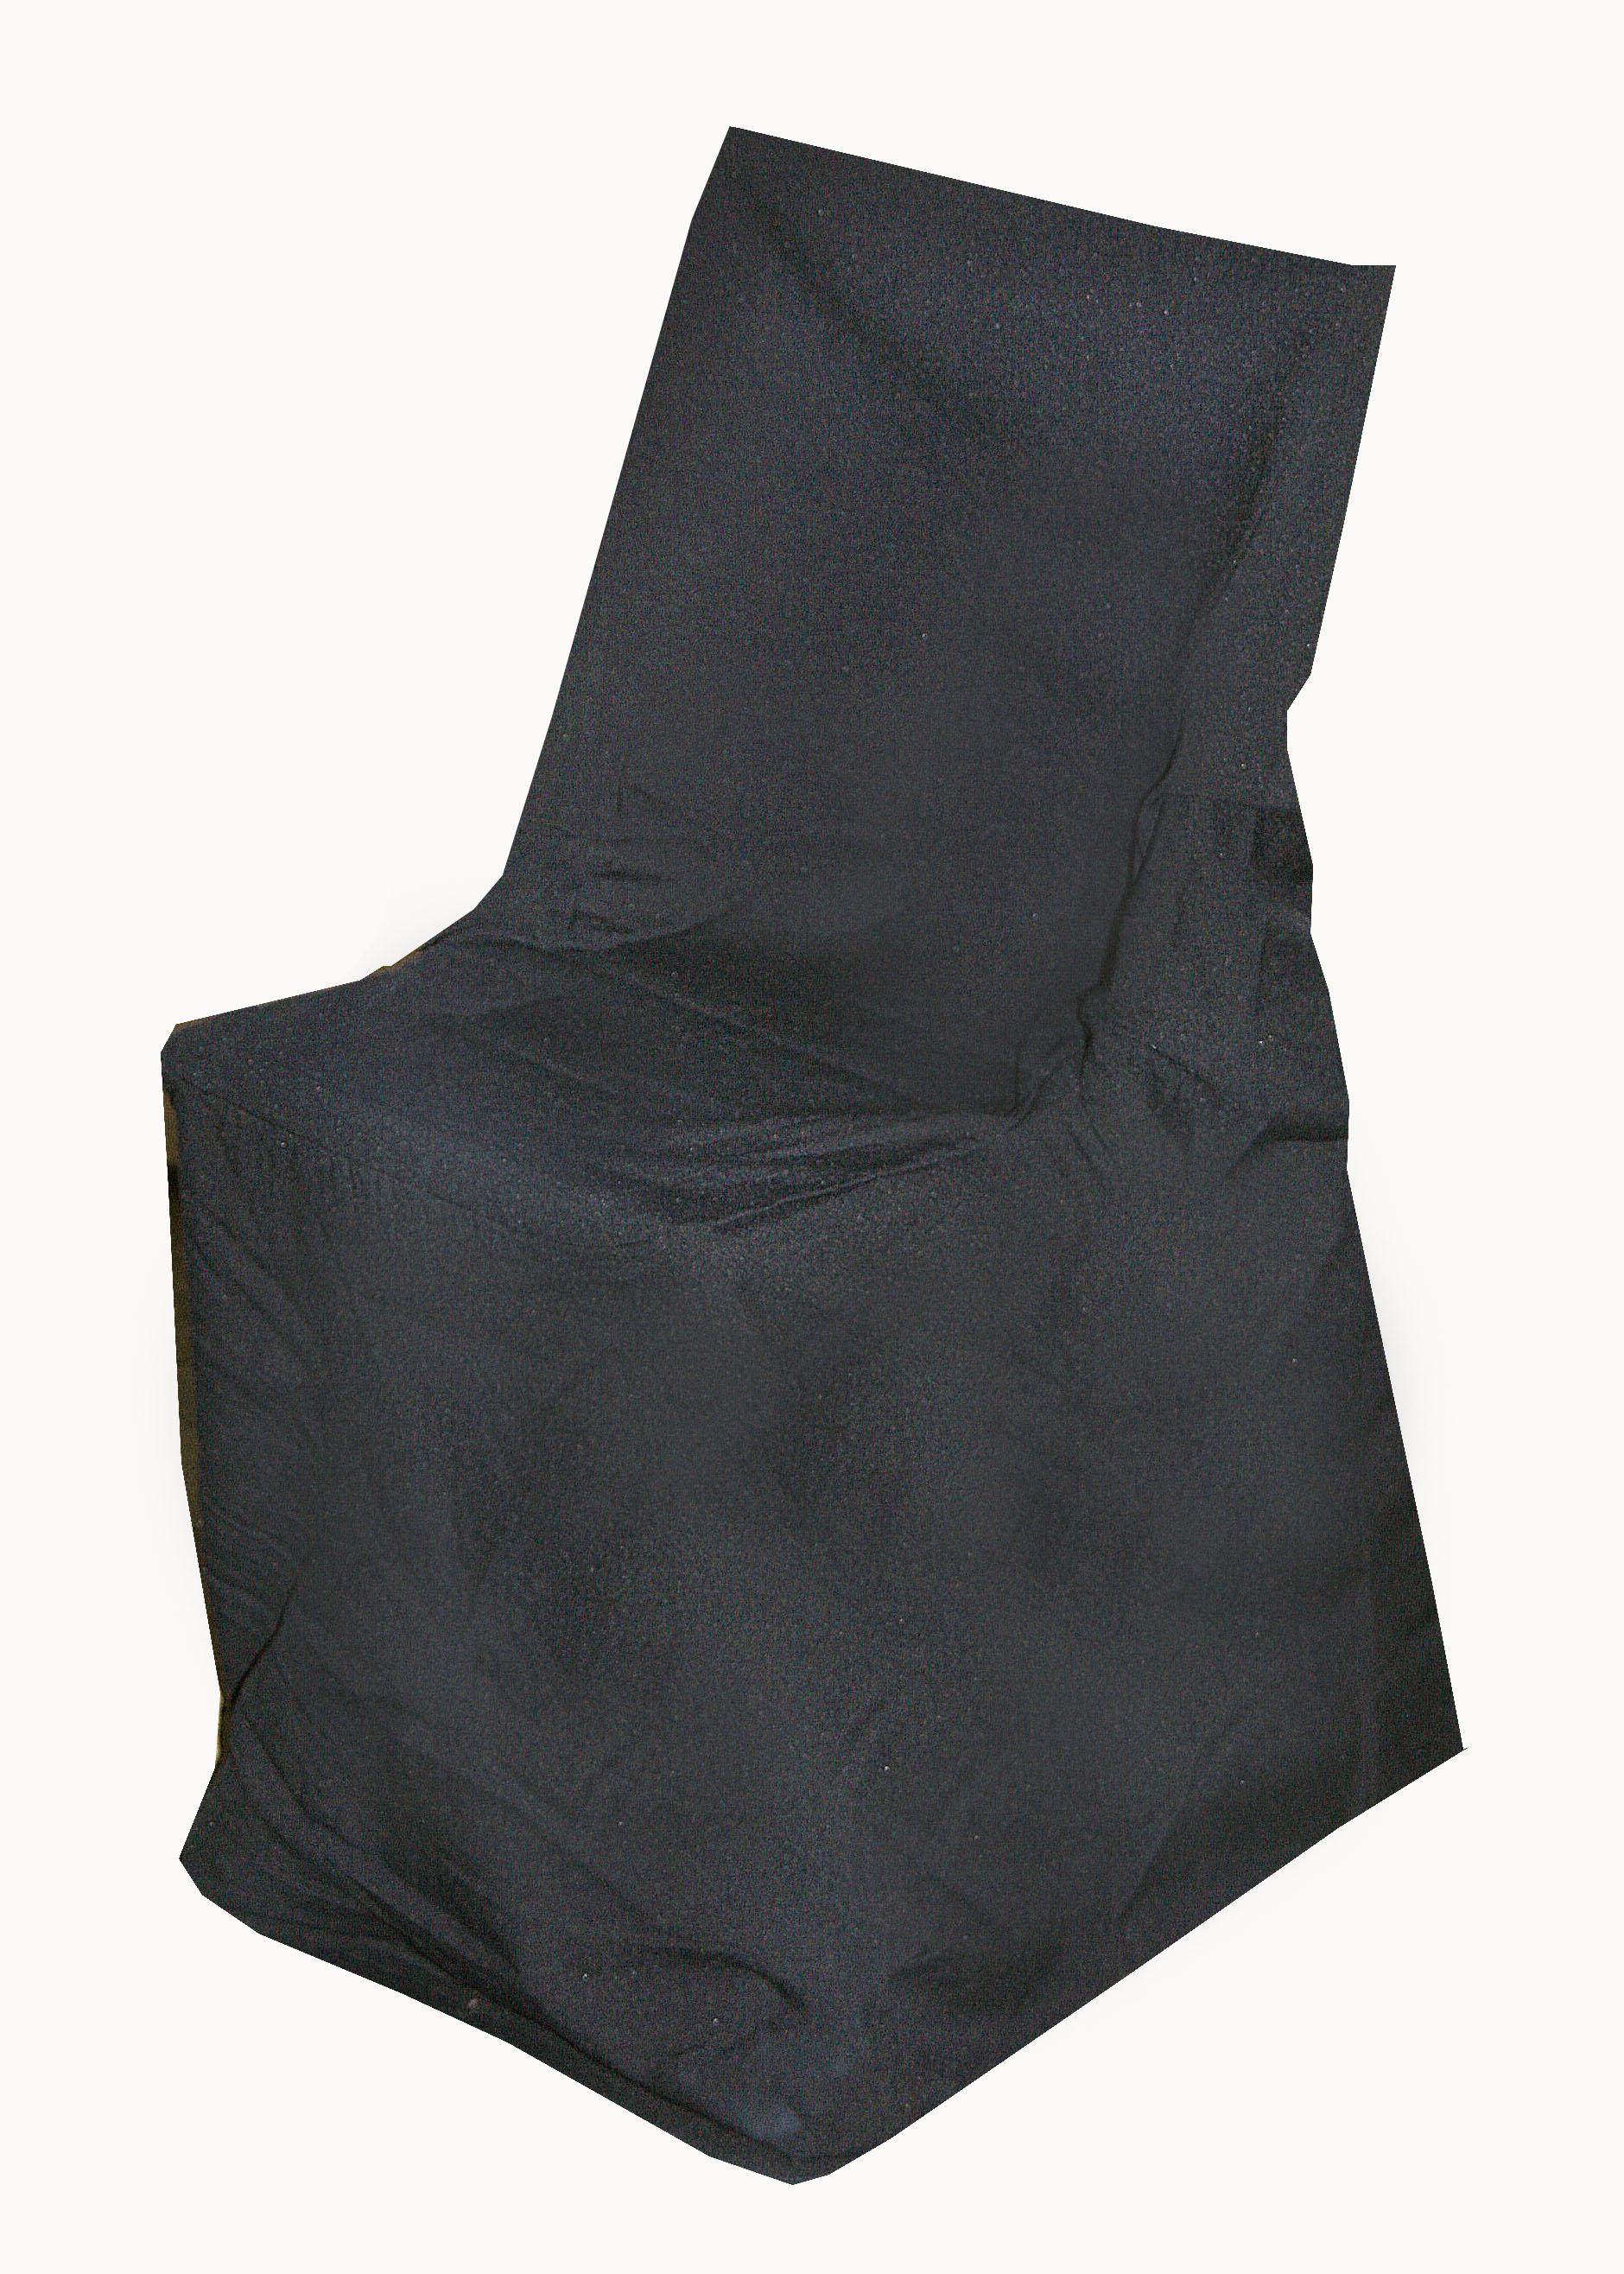 Alquiler de funda negra para silla plegable casagay - Alquiler de fundas de sillas para eventos ...